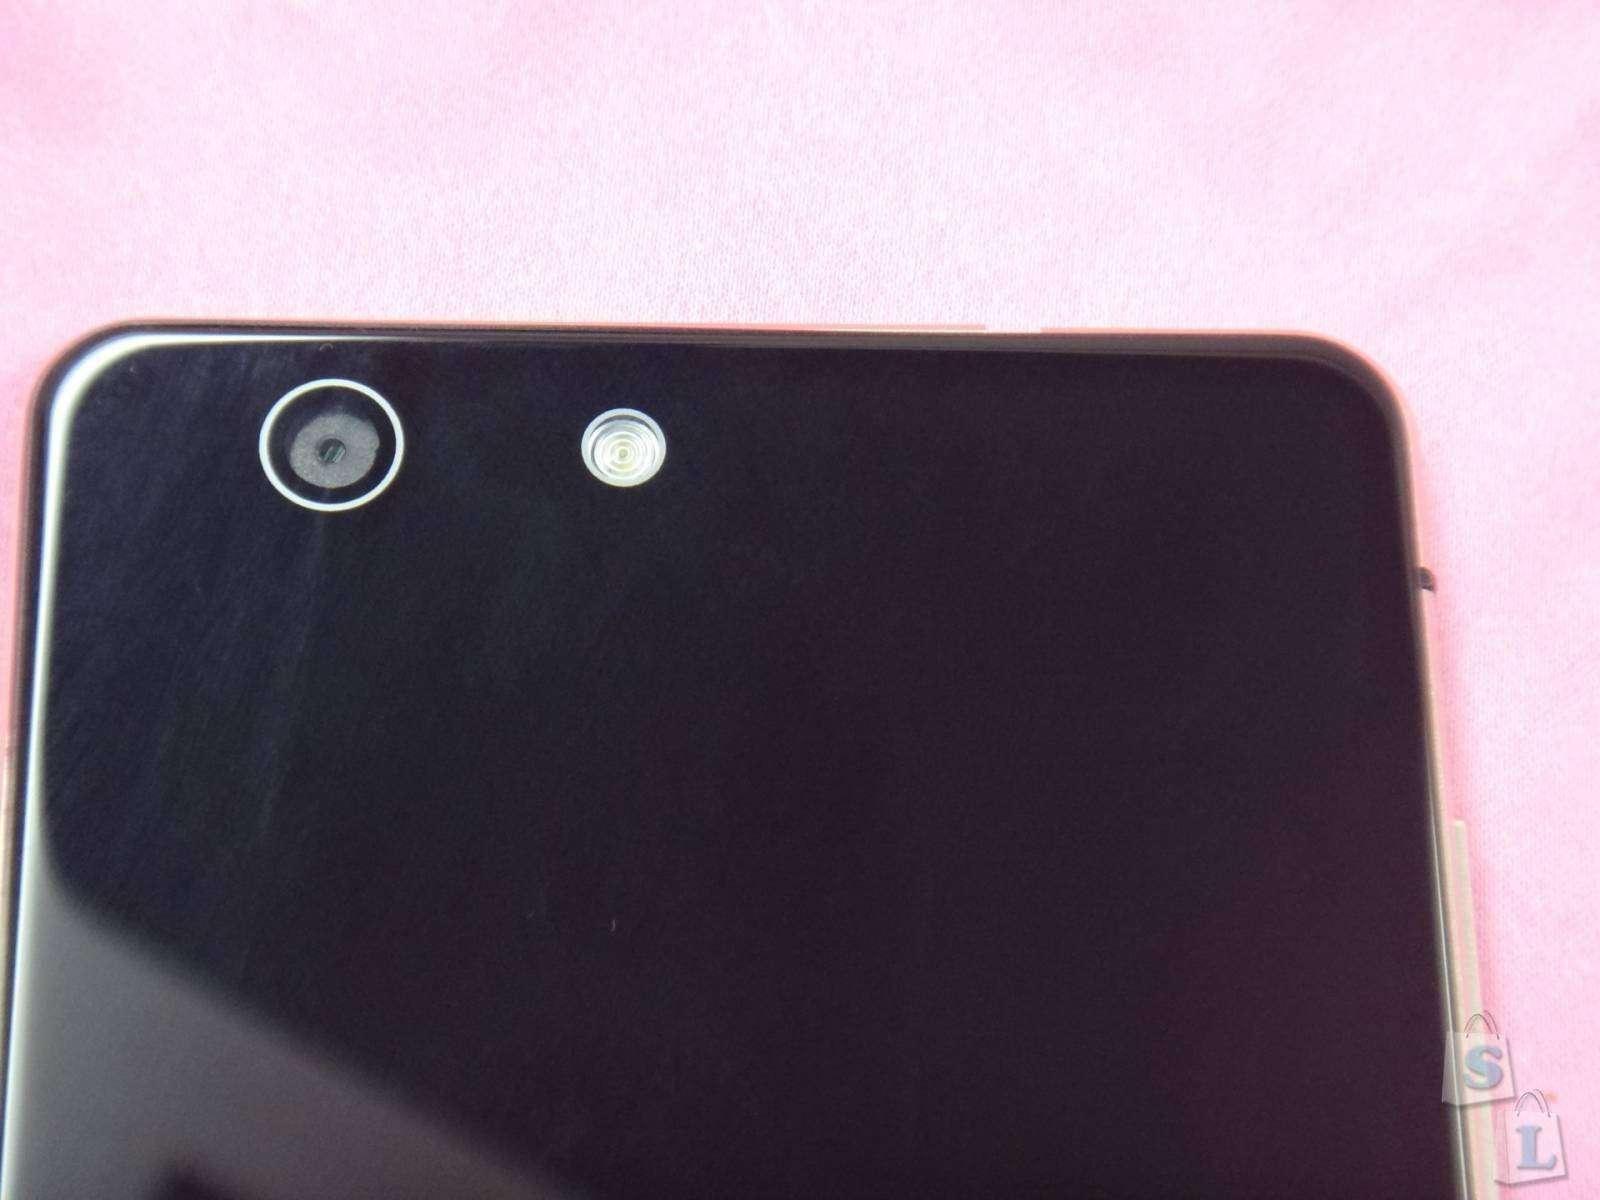 Pandawill: Oukitel U2 бюджетный смартфон стекло и метал в одном корпусе